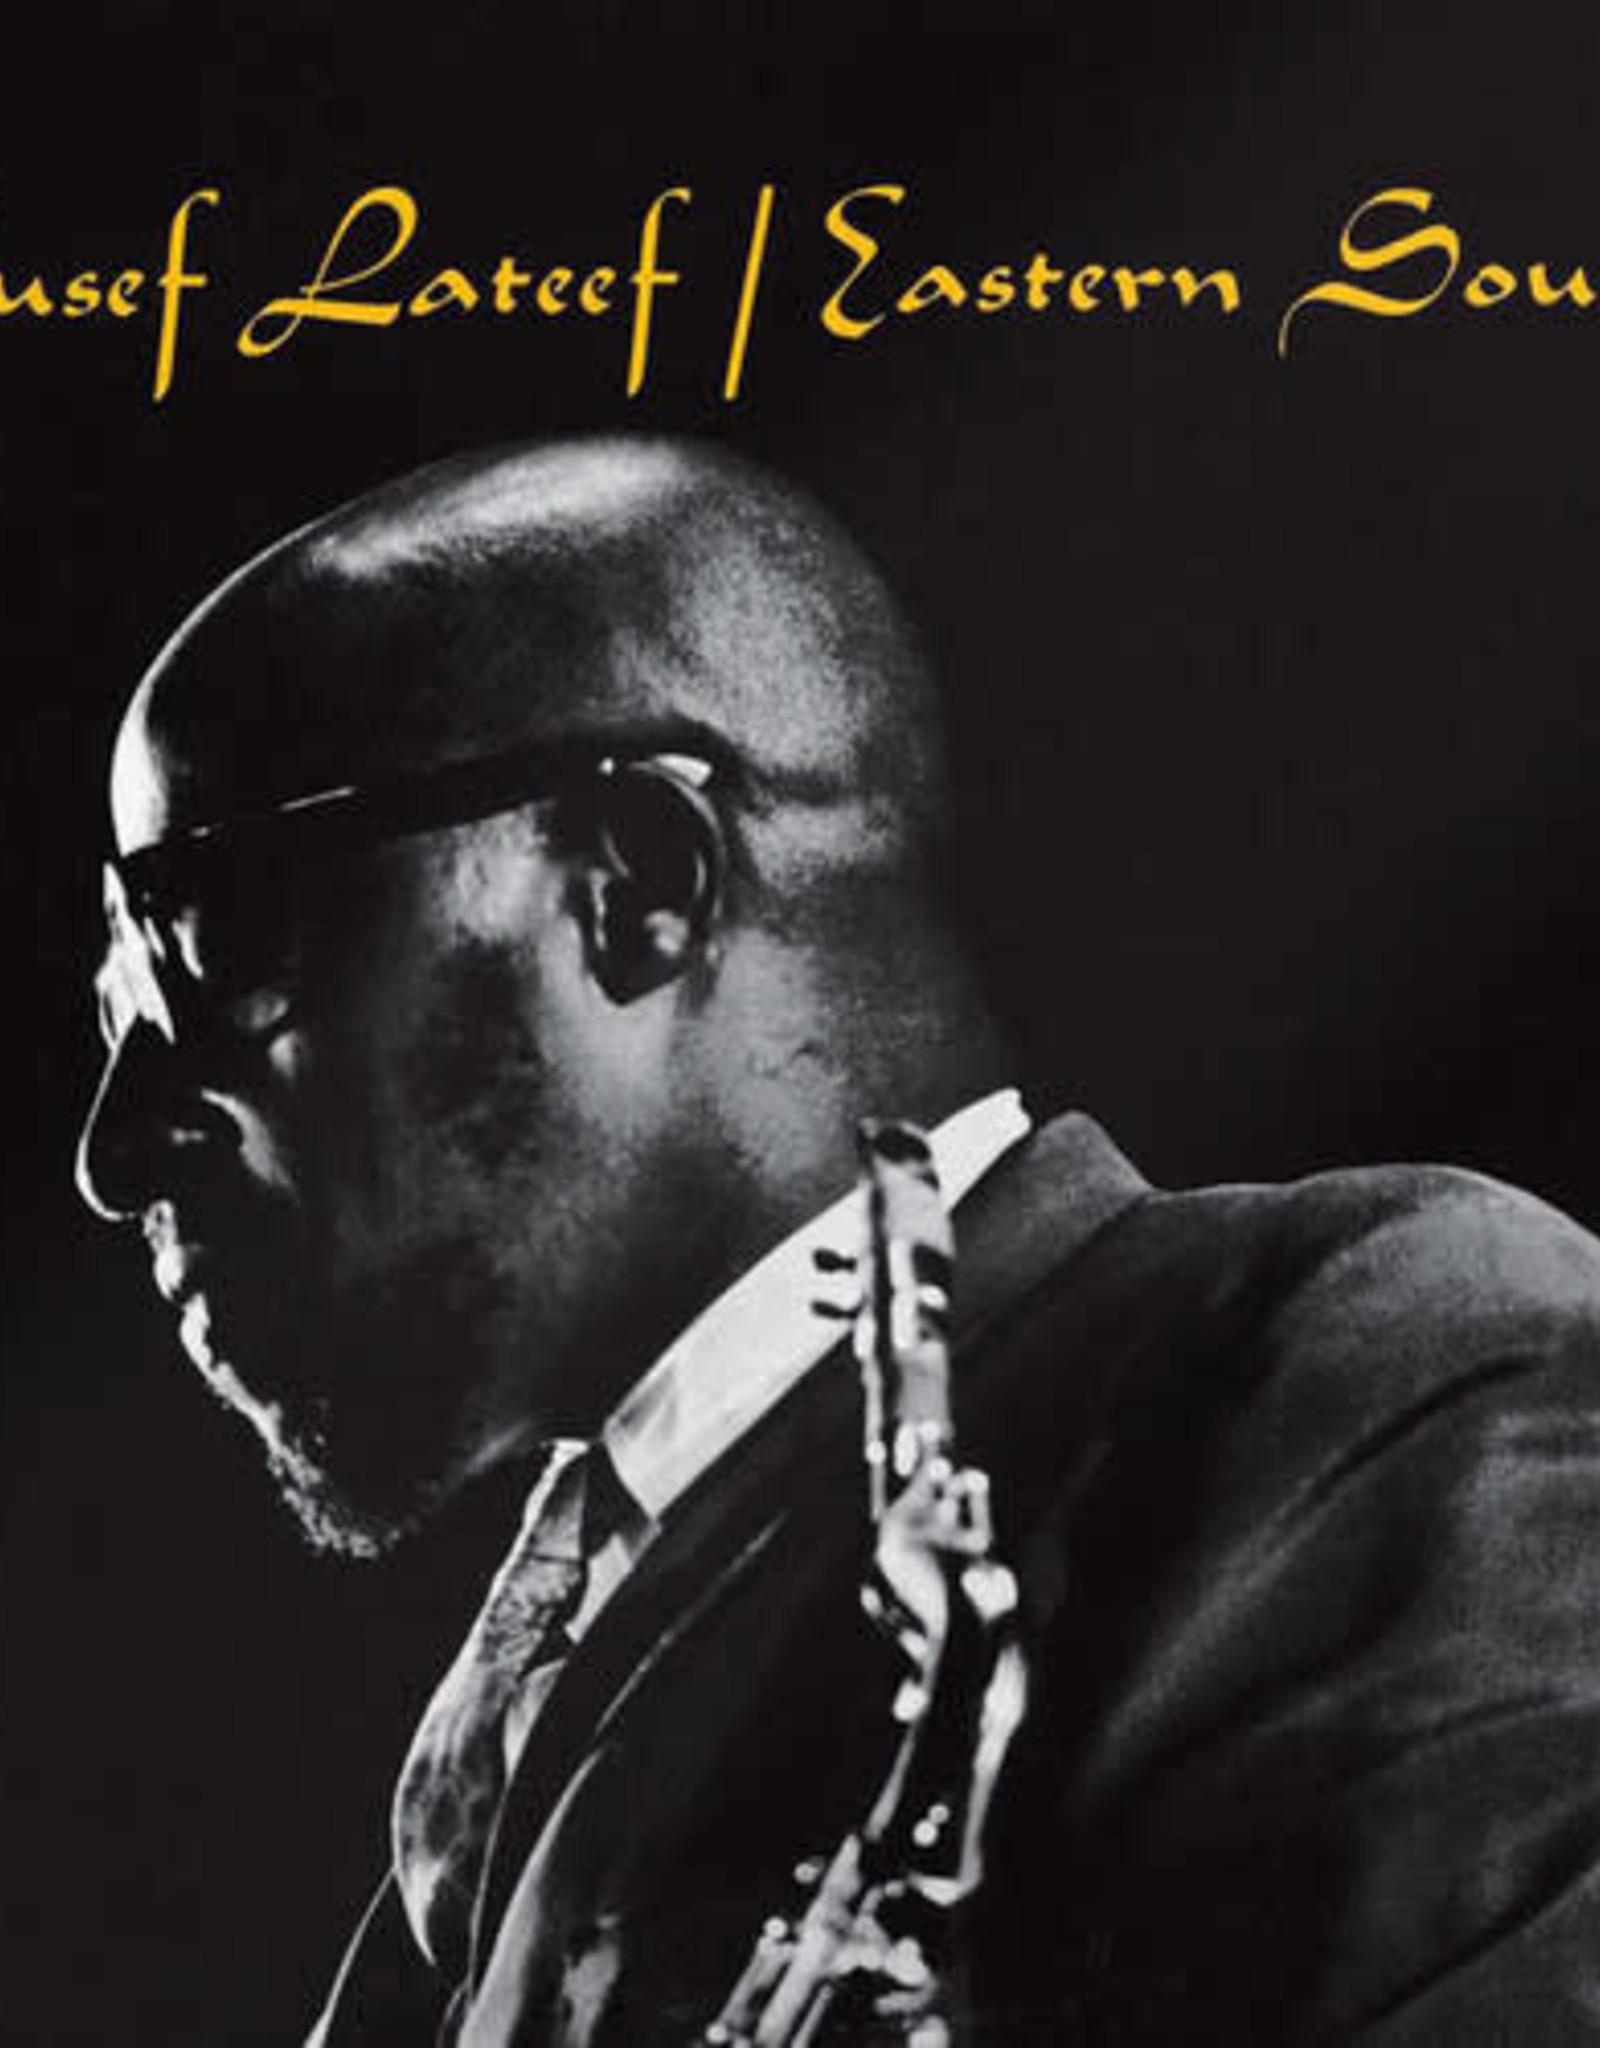 Yusef  Lateef - Eastern Sounds - Vinyl - Single Disc Limited Edition Colored Translucent Blue Vinyl